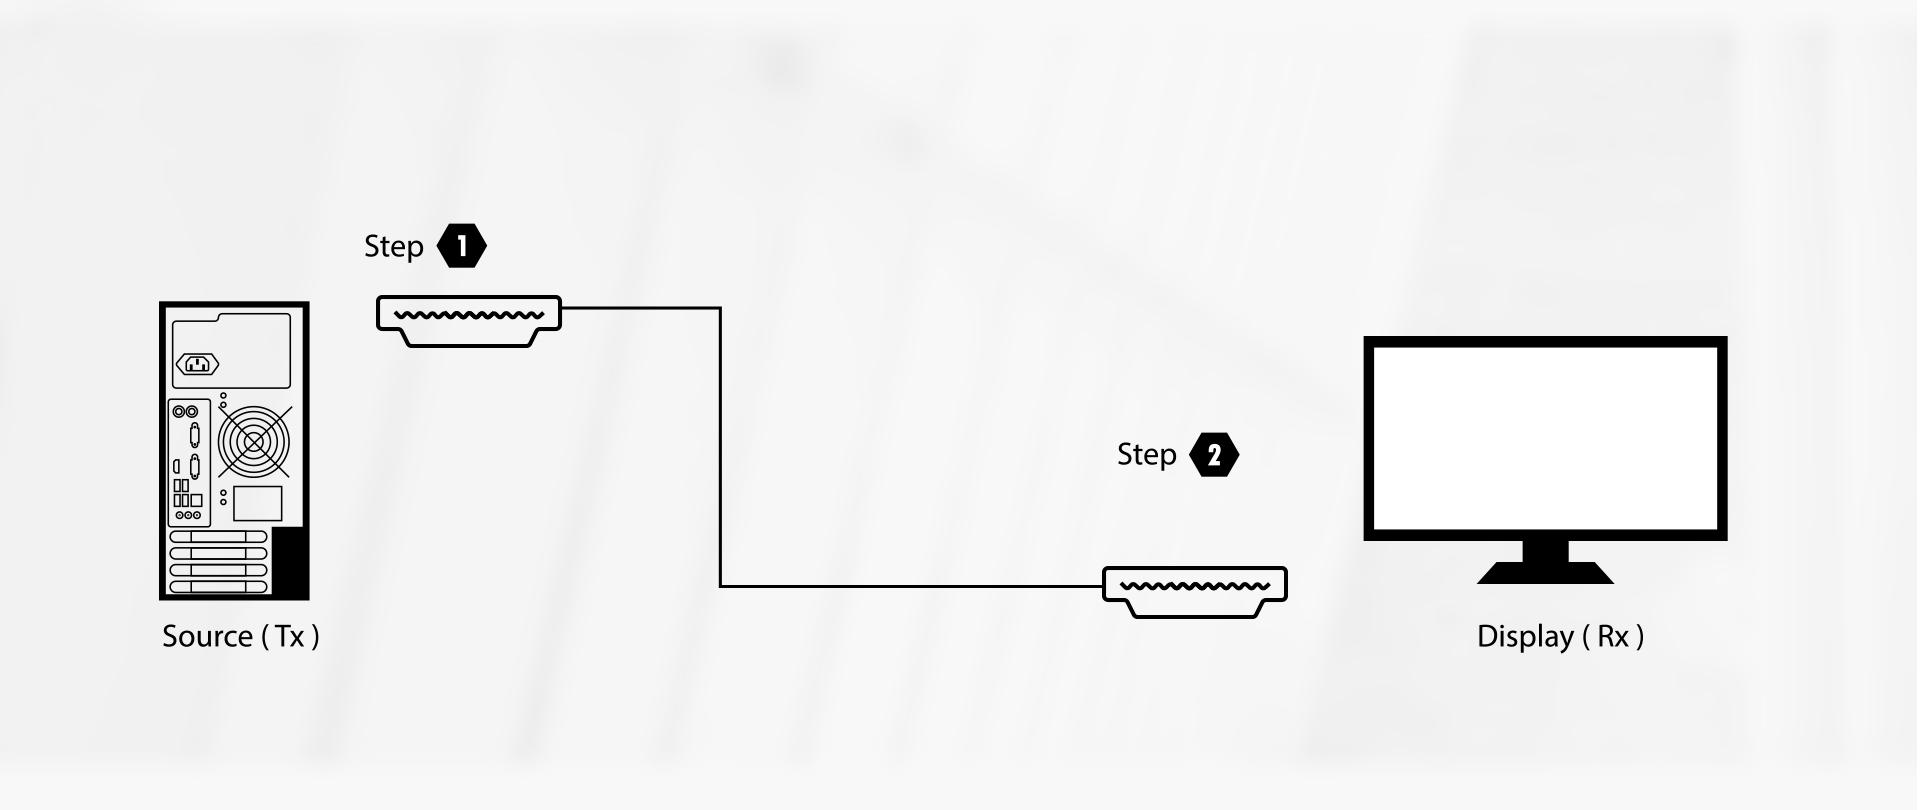 infobit-hdmi-4k-18Gbps-active-optical-fiber-cable